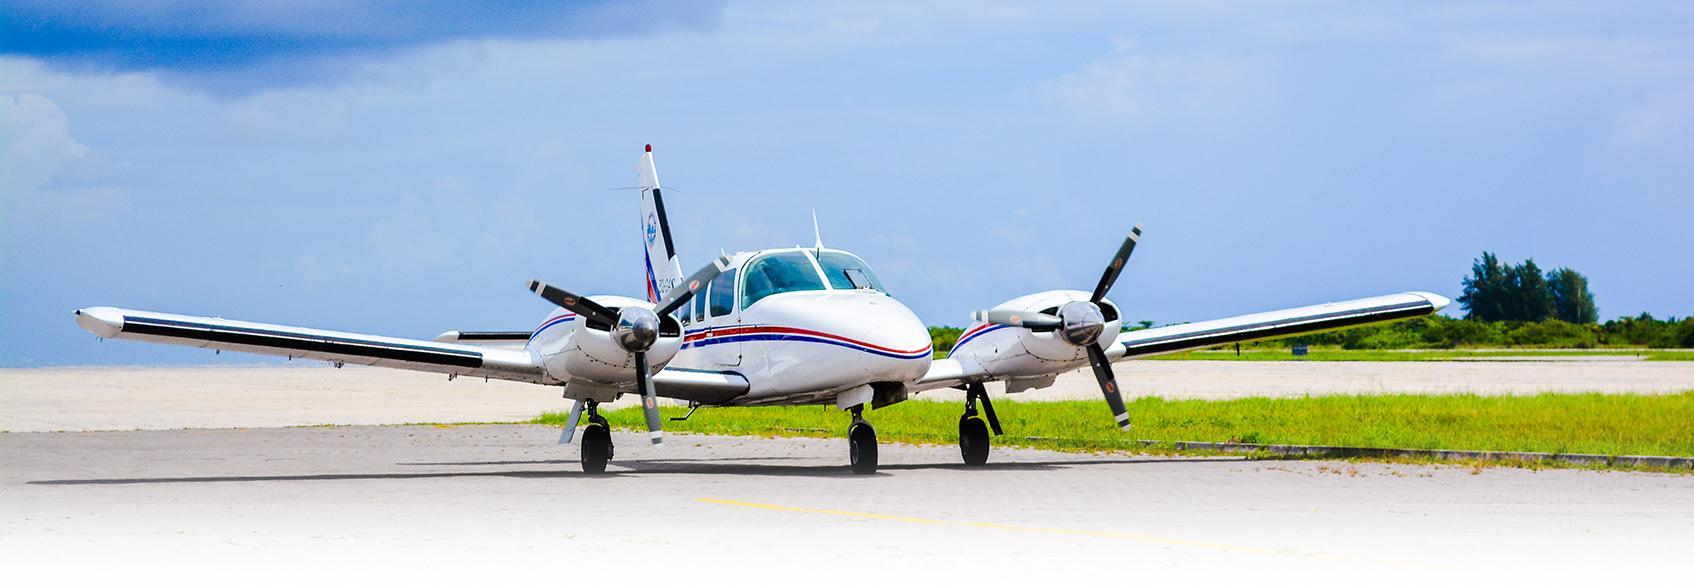 AAA Piper Seneca PA - 34